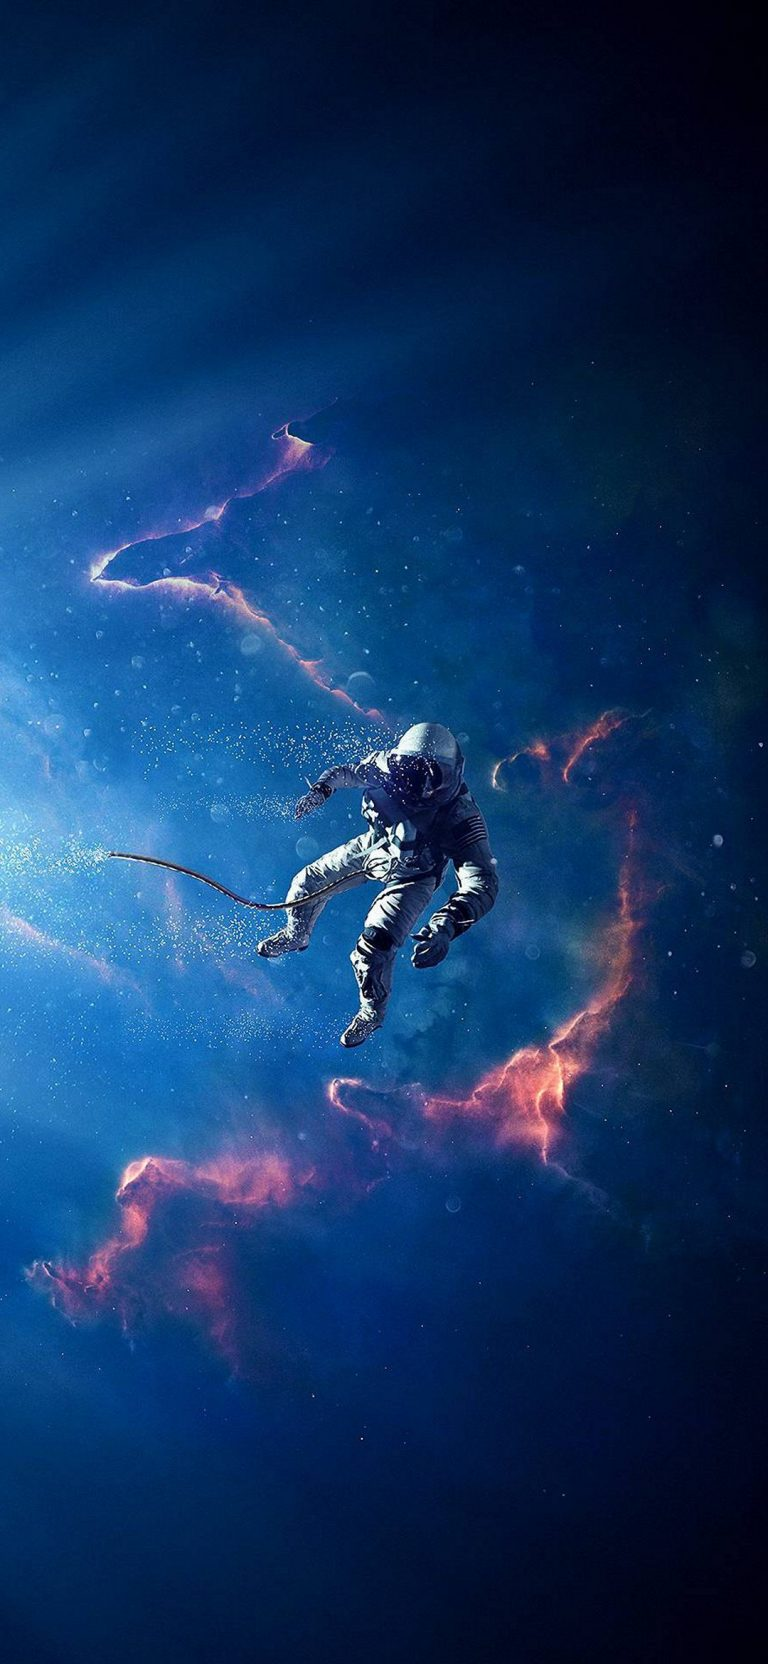 Space Phone Wallpaper 125 1080x2340 768x1664